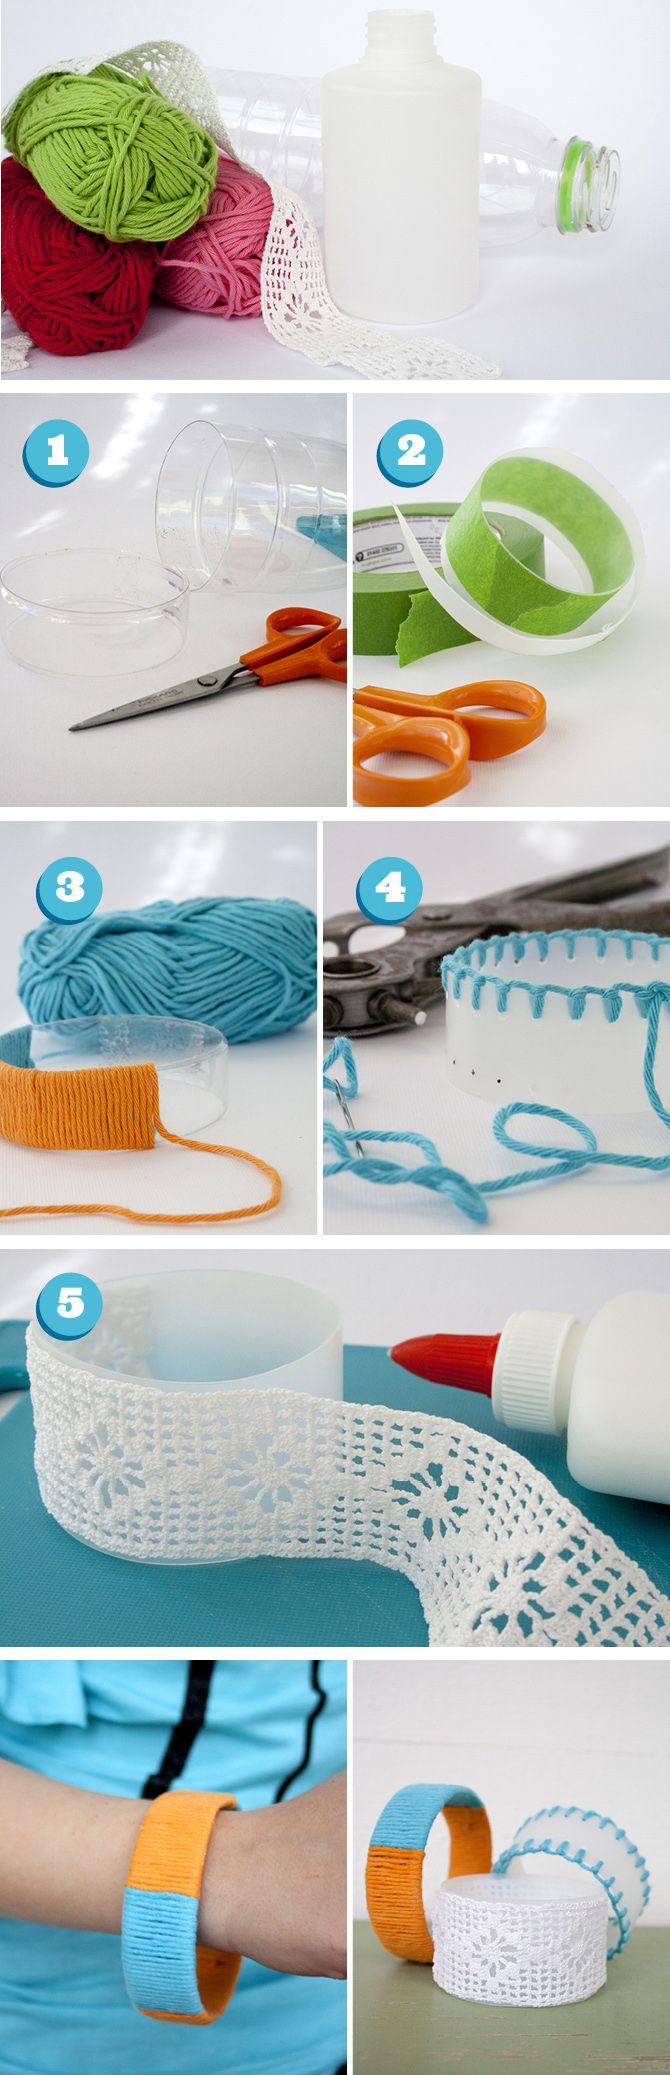 Pysselbolaget from plastic bottle to bracelets make something